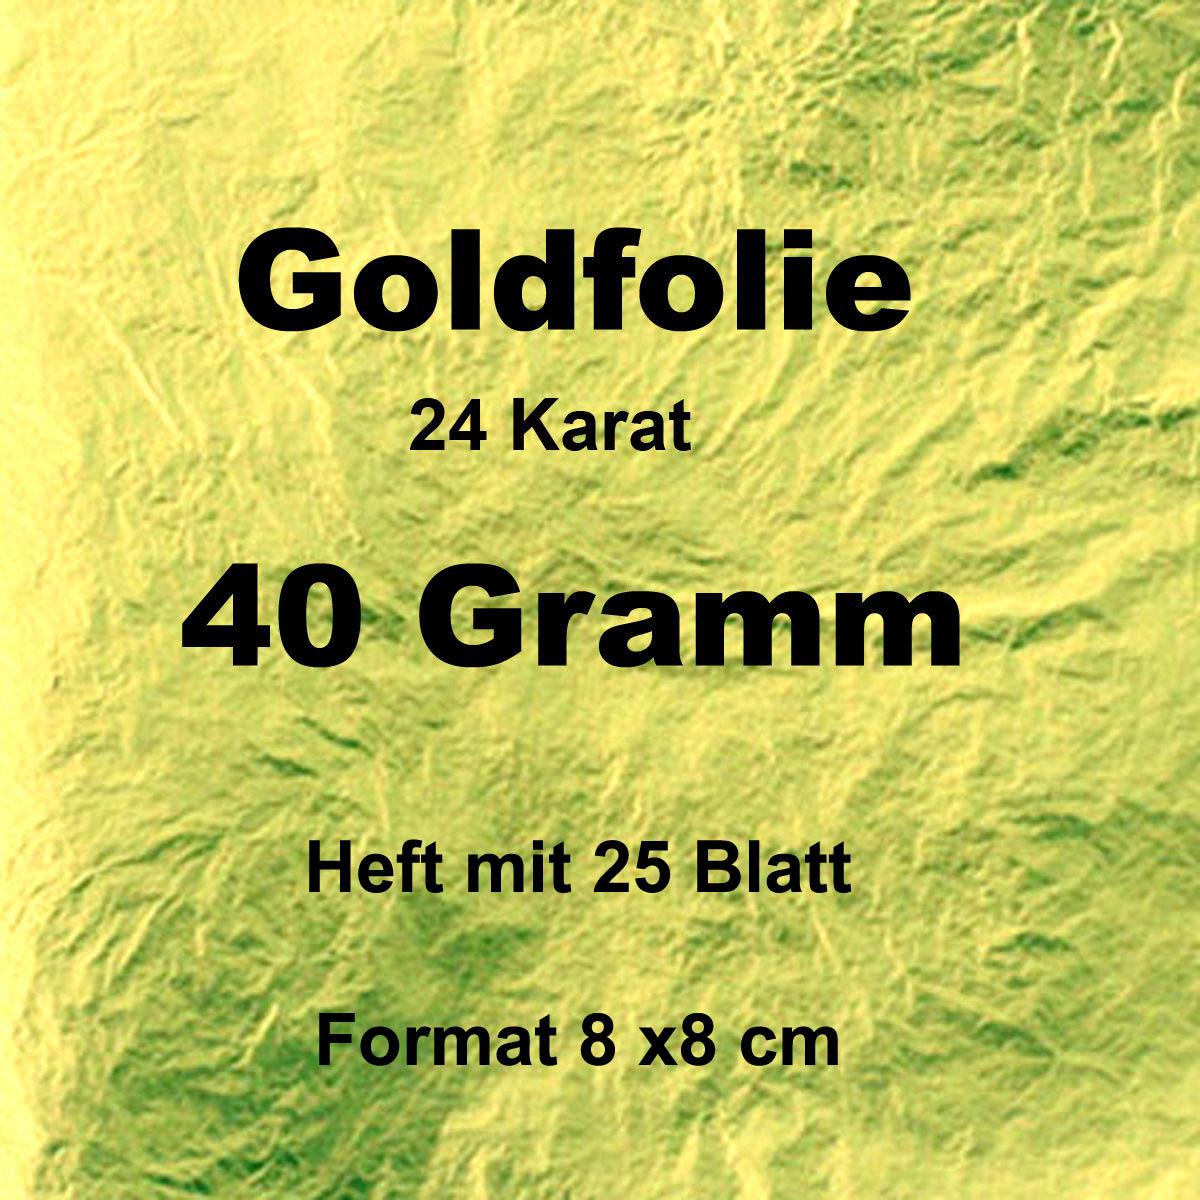 Goldfolie 40 Gr. , Heft mit 25 Blatt, 8x8 cm